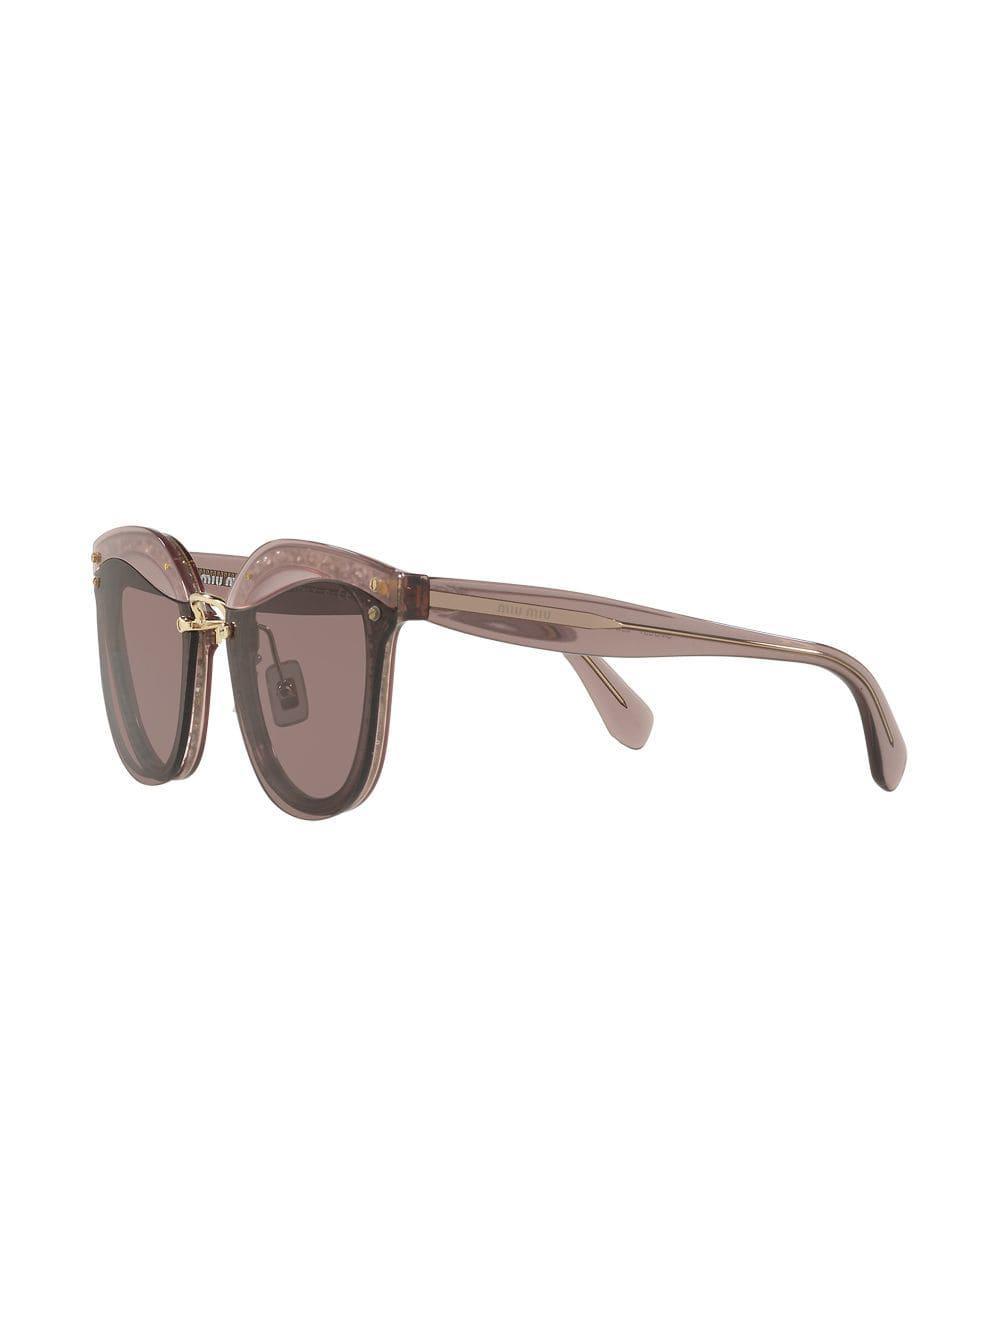 36ff2f41dda Miu Miu Cut Out Glitter Wayfarers in Pink - Lyst